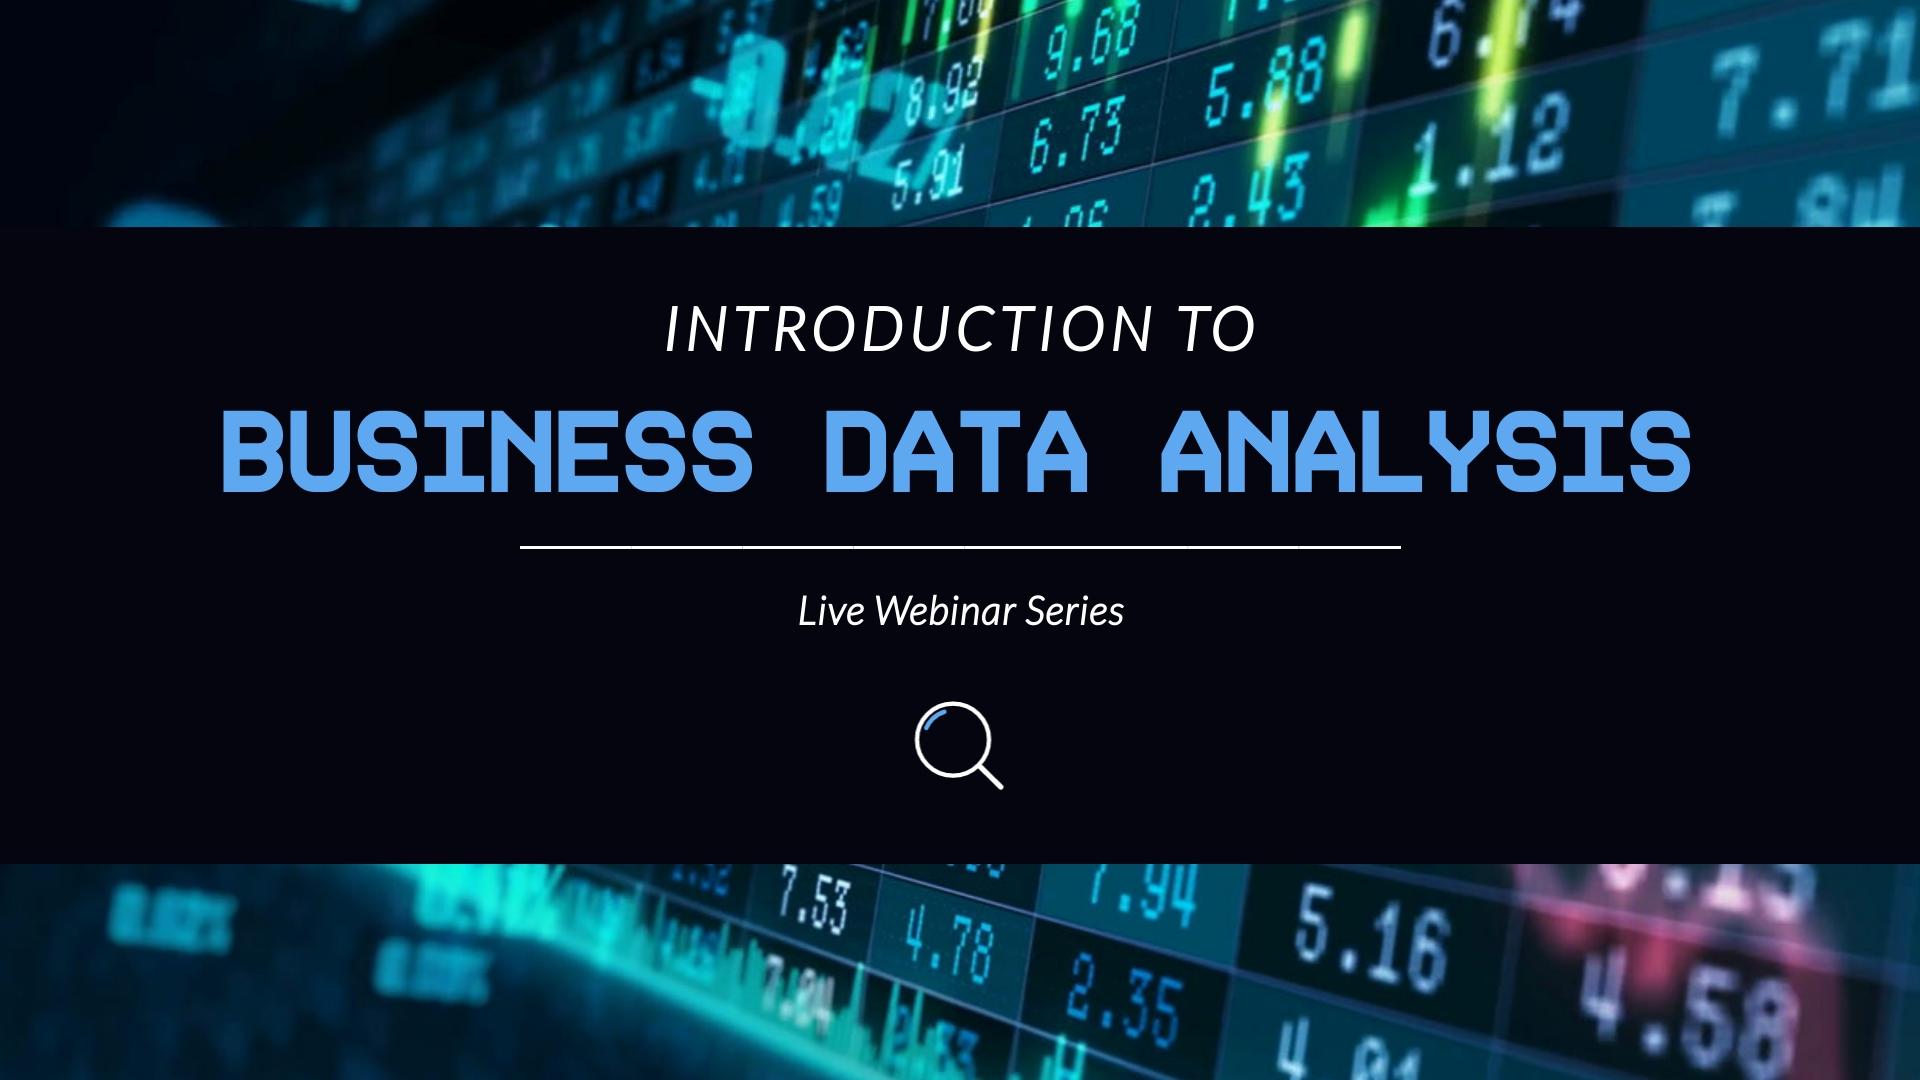 Data Analysis Intro - Video Template